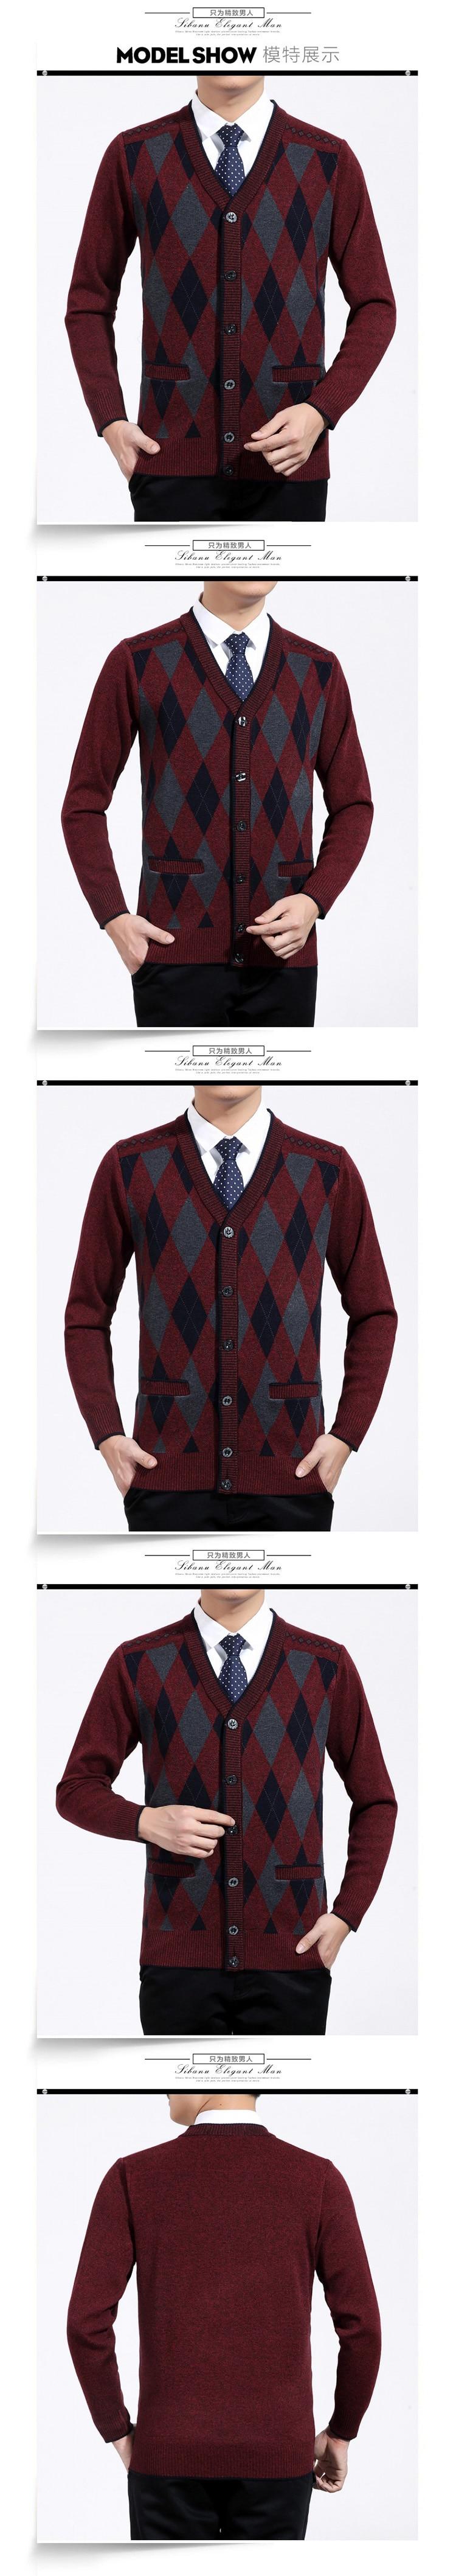 Man Woollen Cashmere Cardigan Sweaters Textured Knitted Sweater Men V-neck Cardigan Elegance Knitwear Business Casual Wear (6)